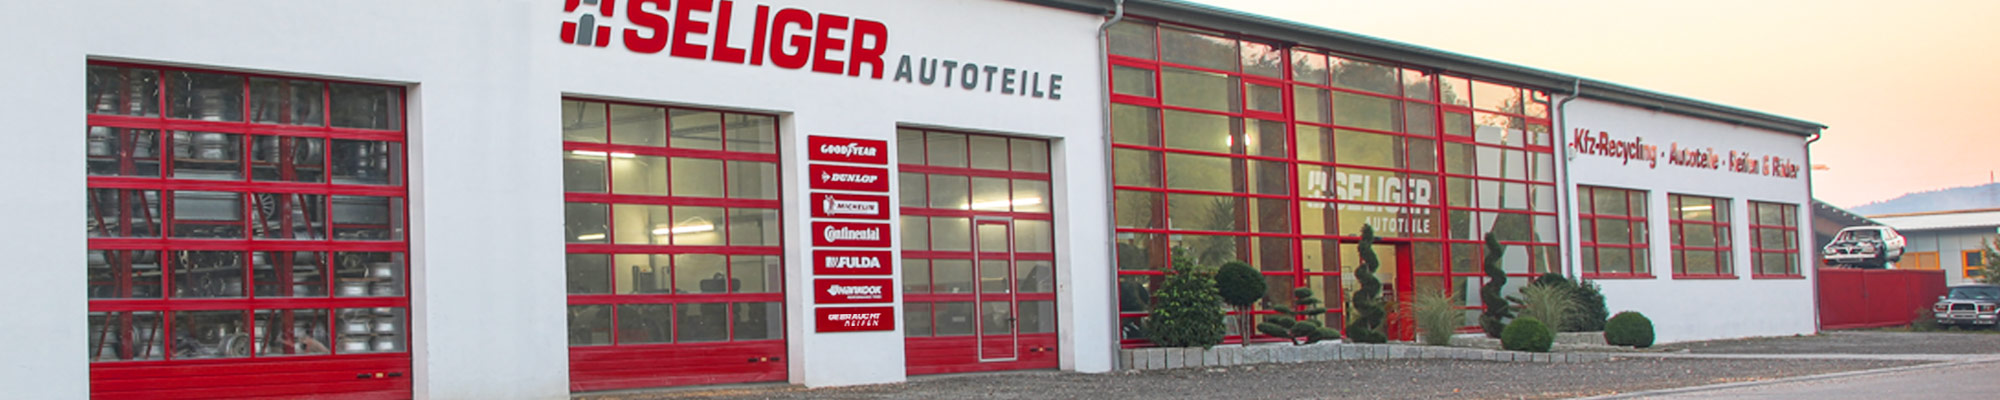 Home - Seliger Autoteile GmbH & CO. KG | KFZ-Recycling Autoteile Reifen